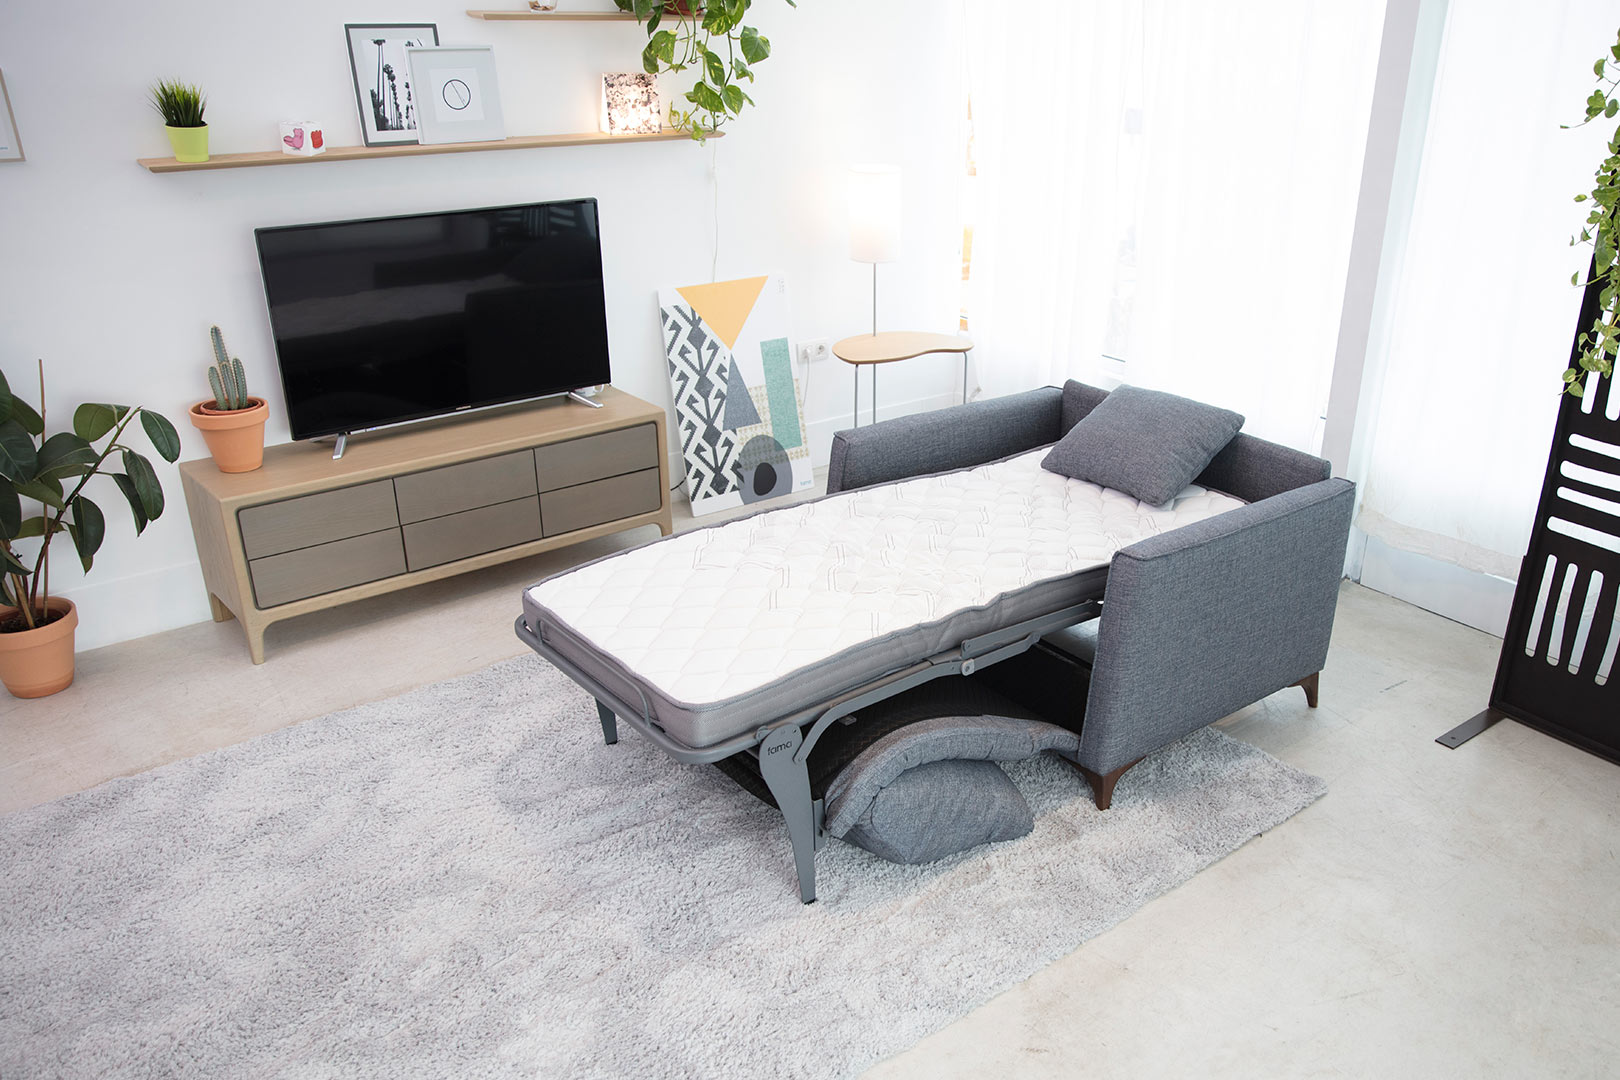 Dali sillón cama 2020 04